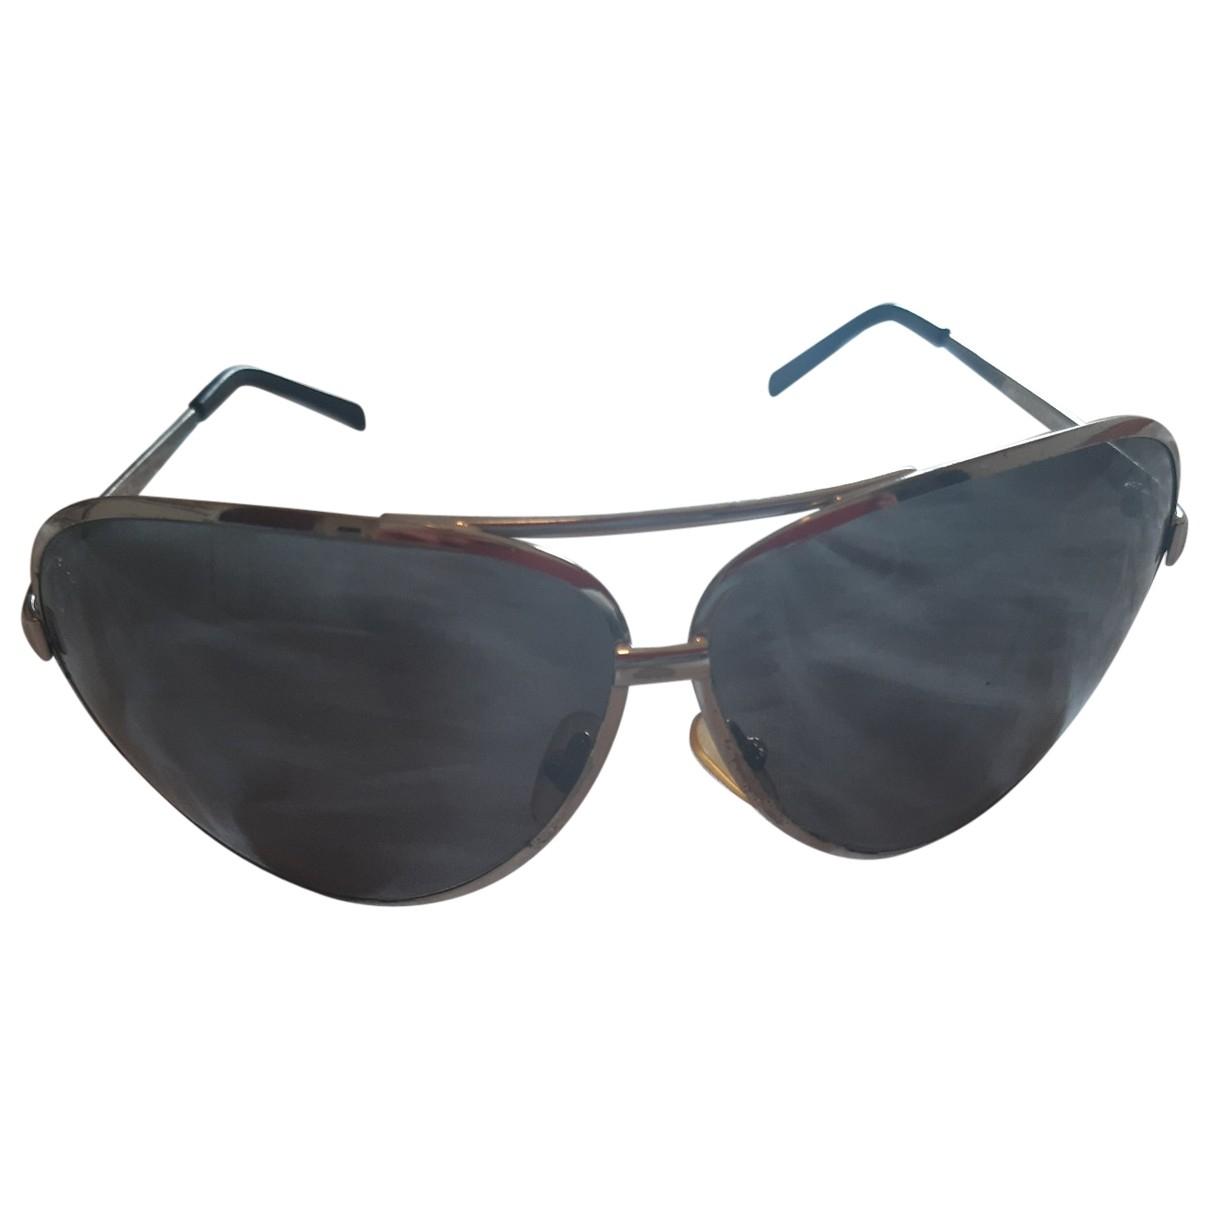 Gafas oversize Gianfranco Ferre